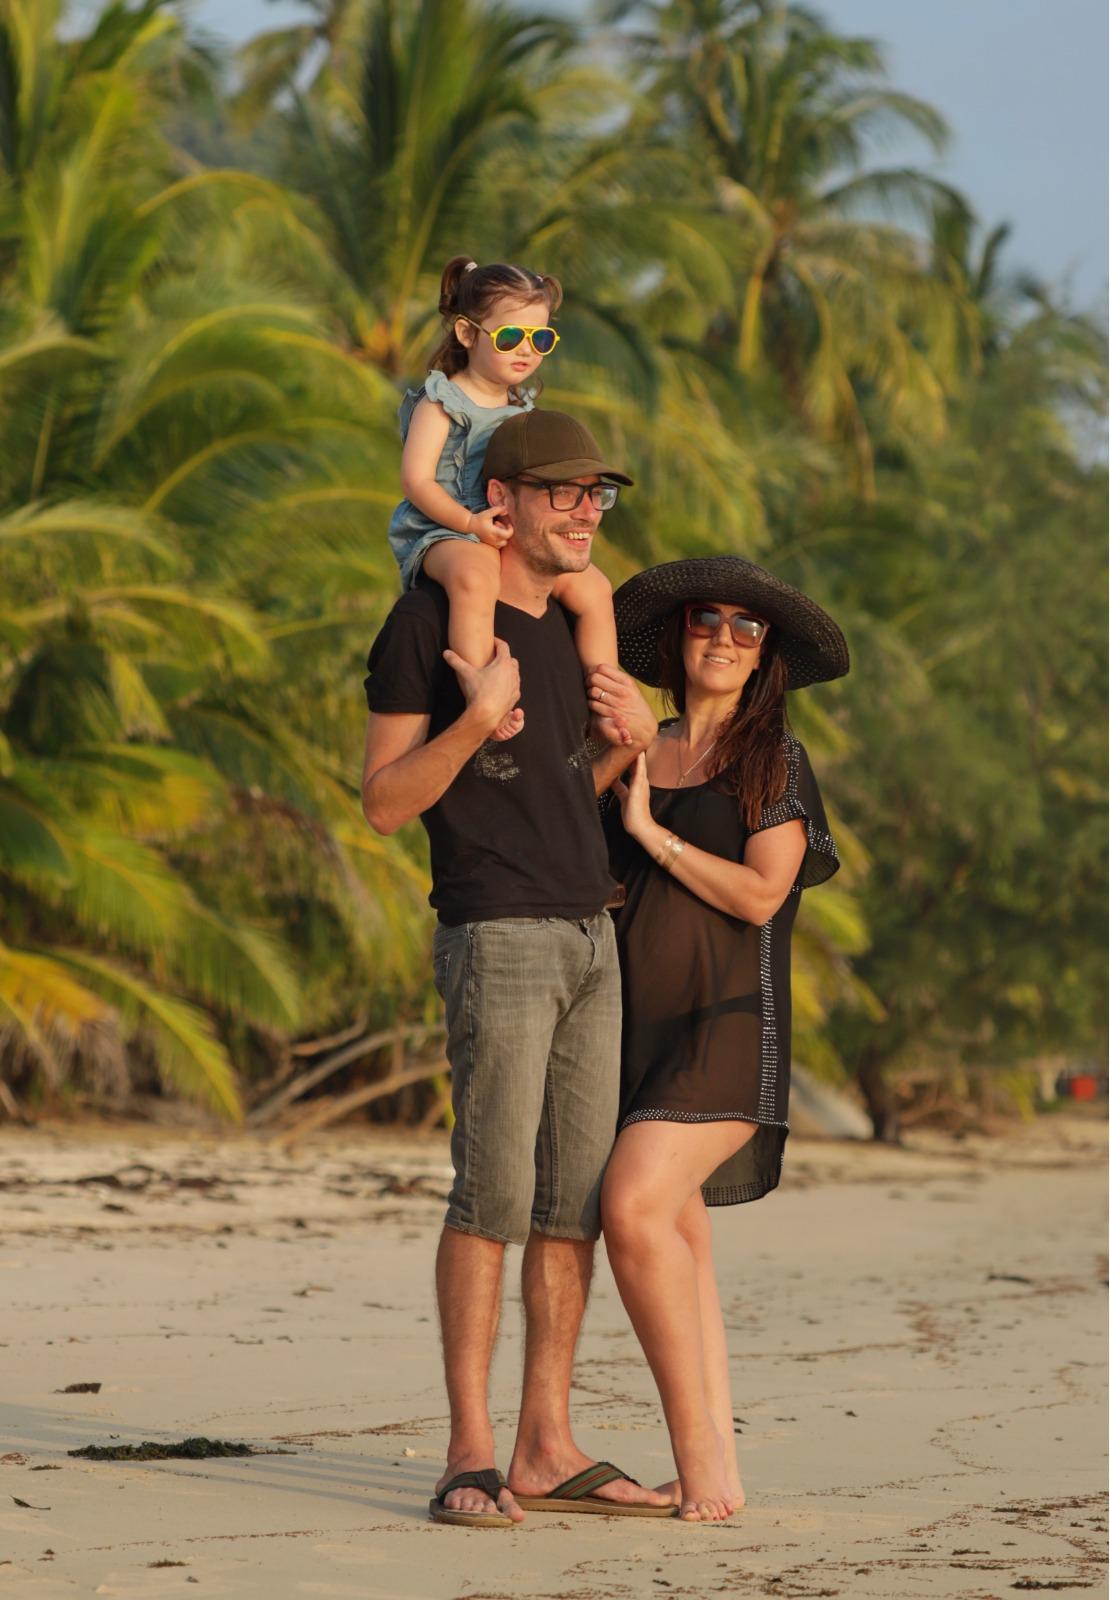 Hila Nachmani and Family Photo by Nati Maman